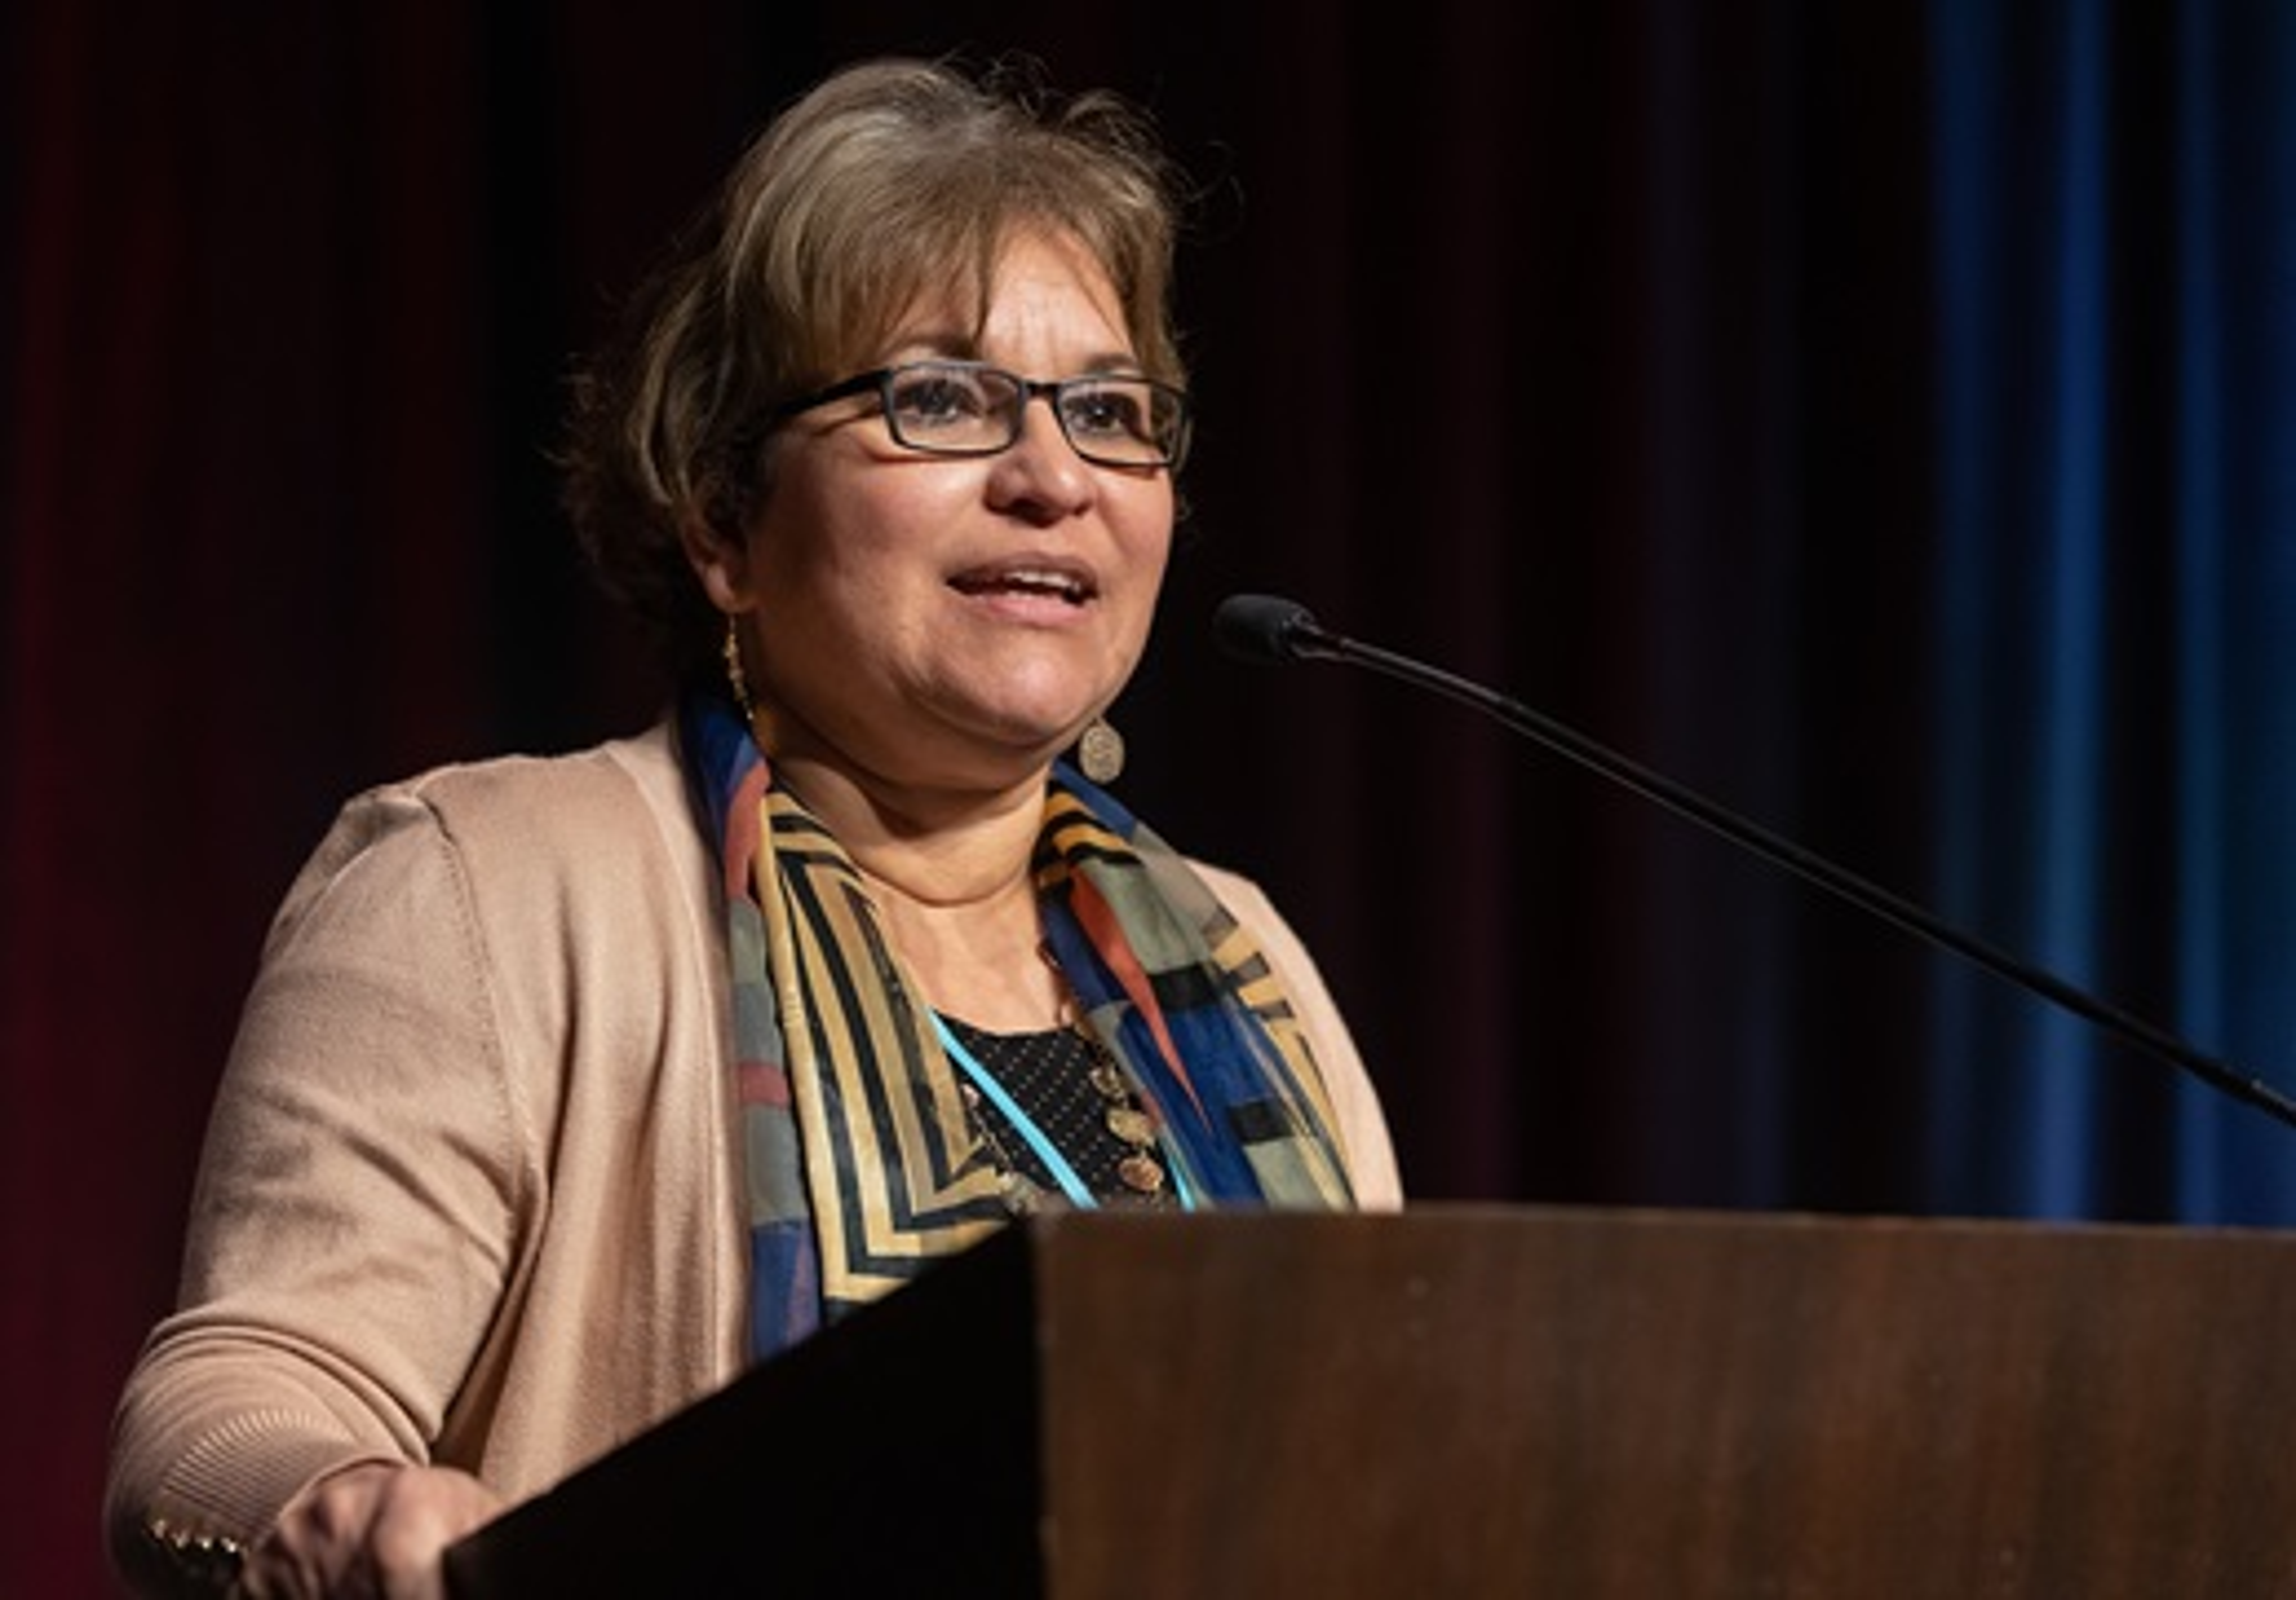 Revda. Lyssette Perez, Pastora en la IMU Oasis en Pleasantville, Nueva Jersey y presidenta de MARCHA. Foto Mike DuBose, Noticias MU.